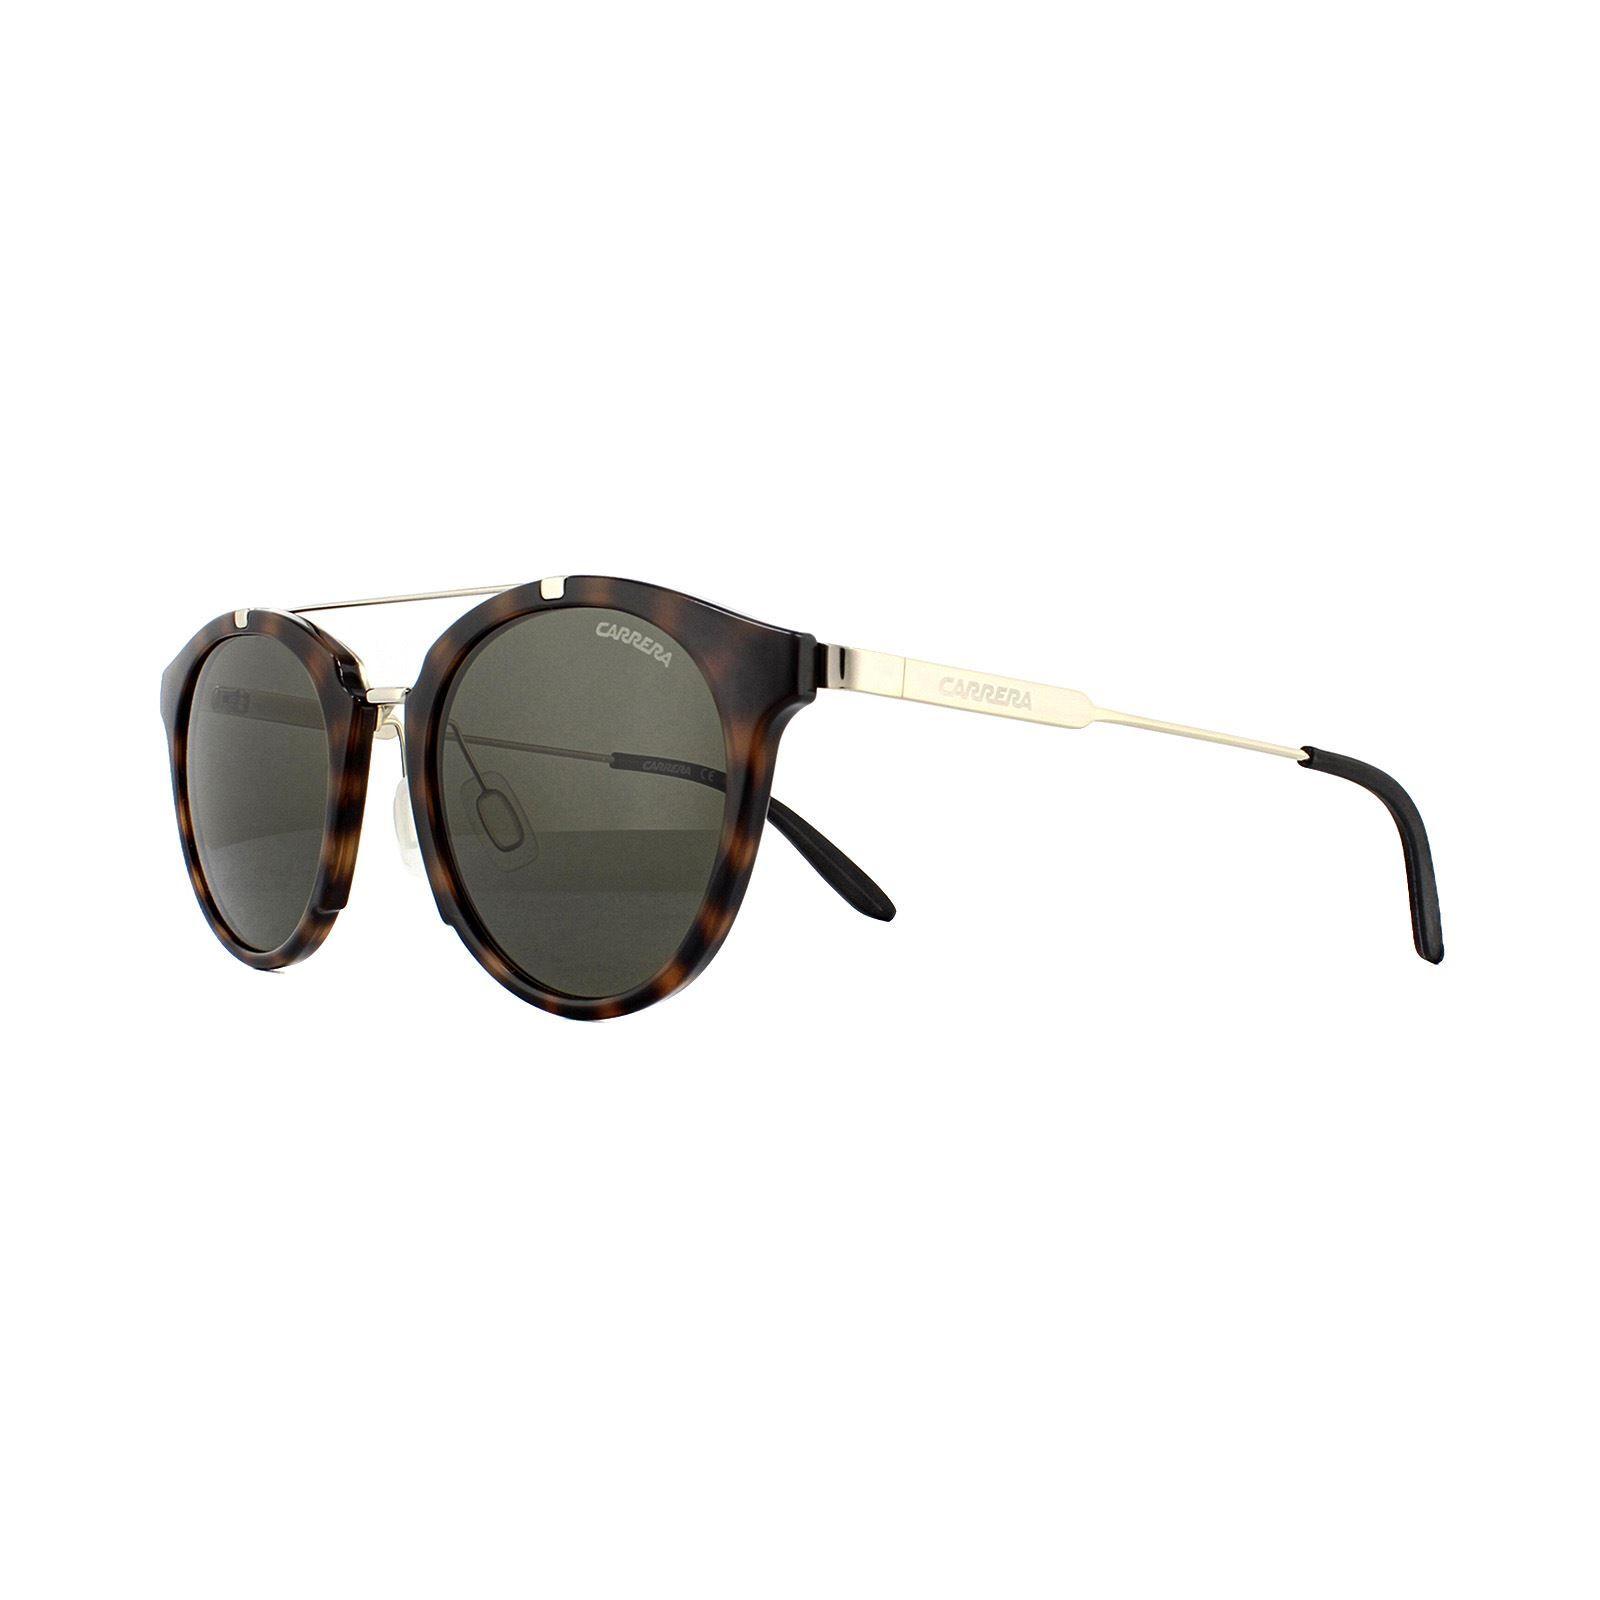 Carrera Sunglasses 126/S SCT 70 Havana Gold Brown